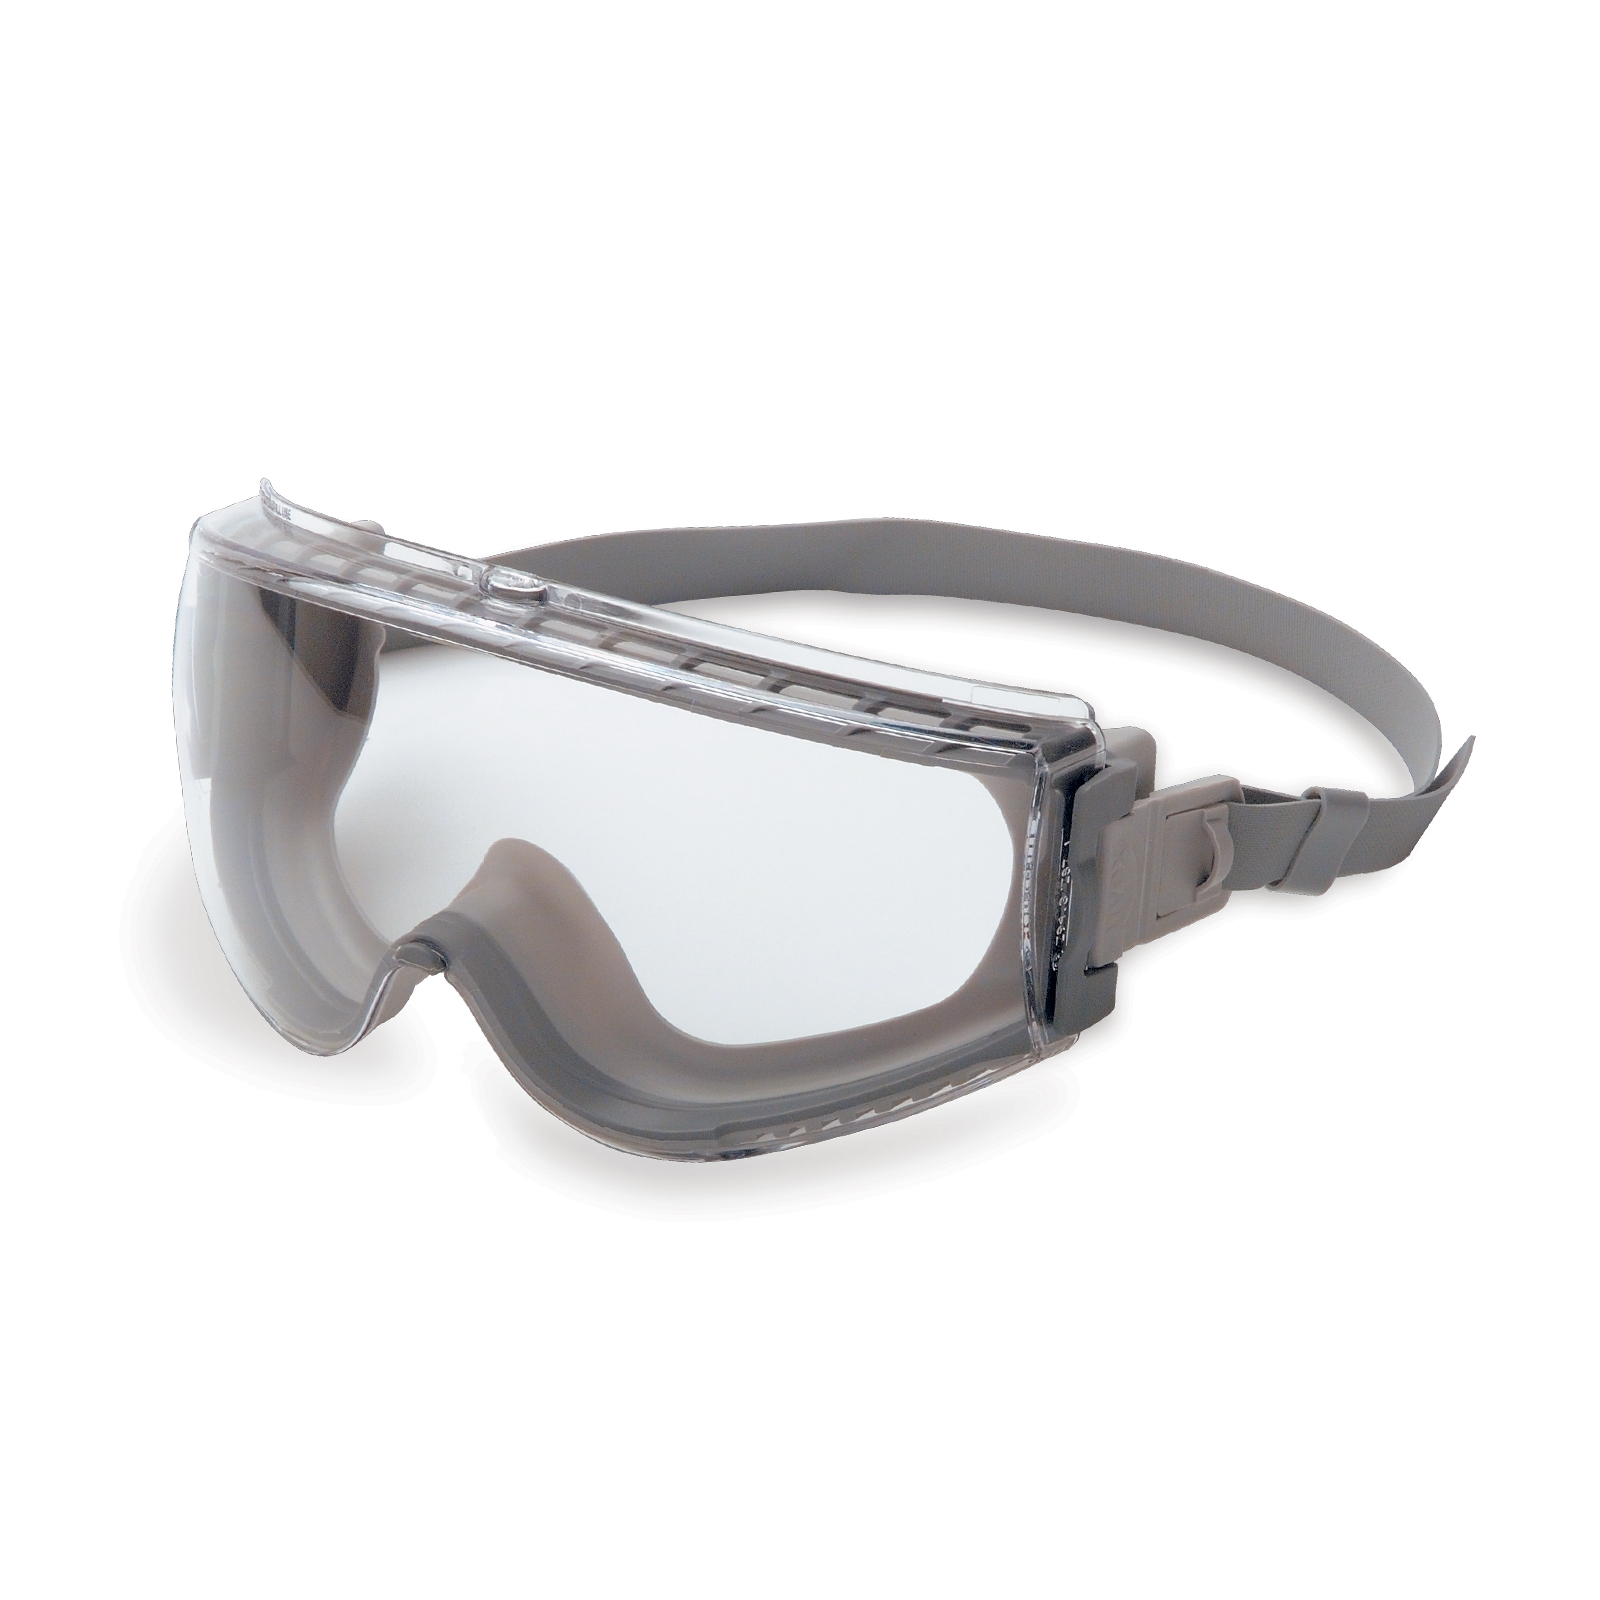 uvex-stealth_s3960c-45-Securovision